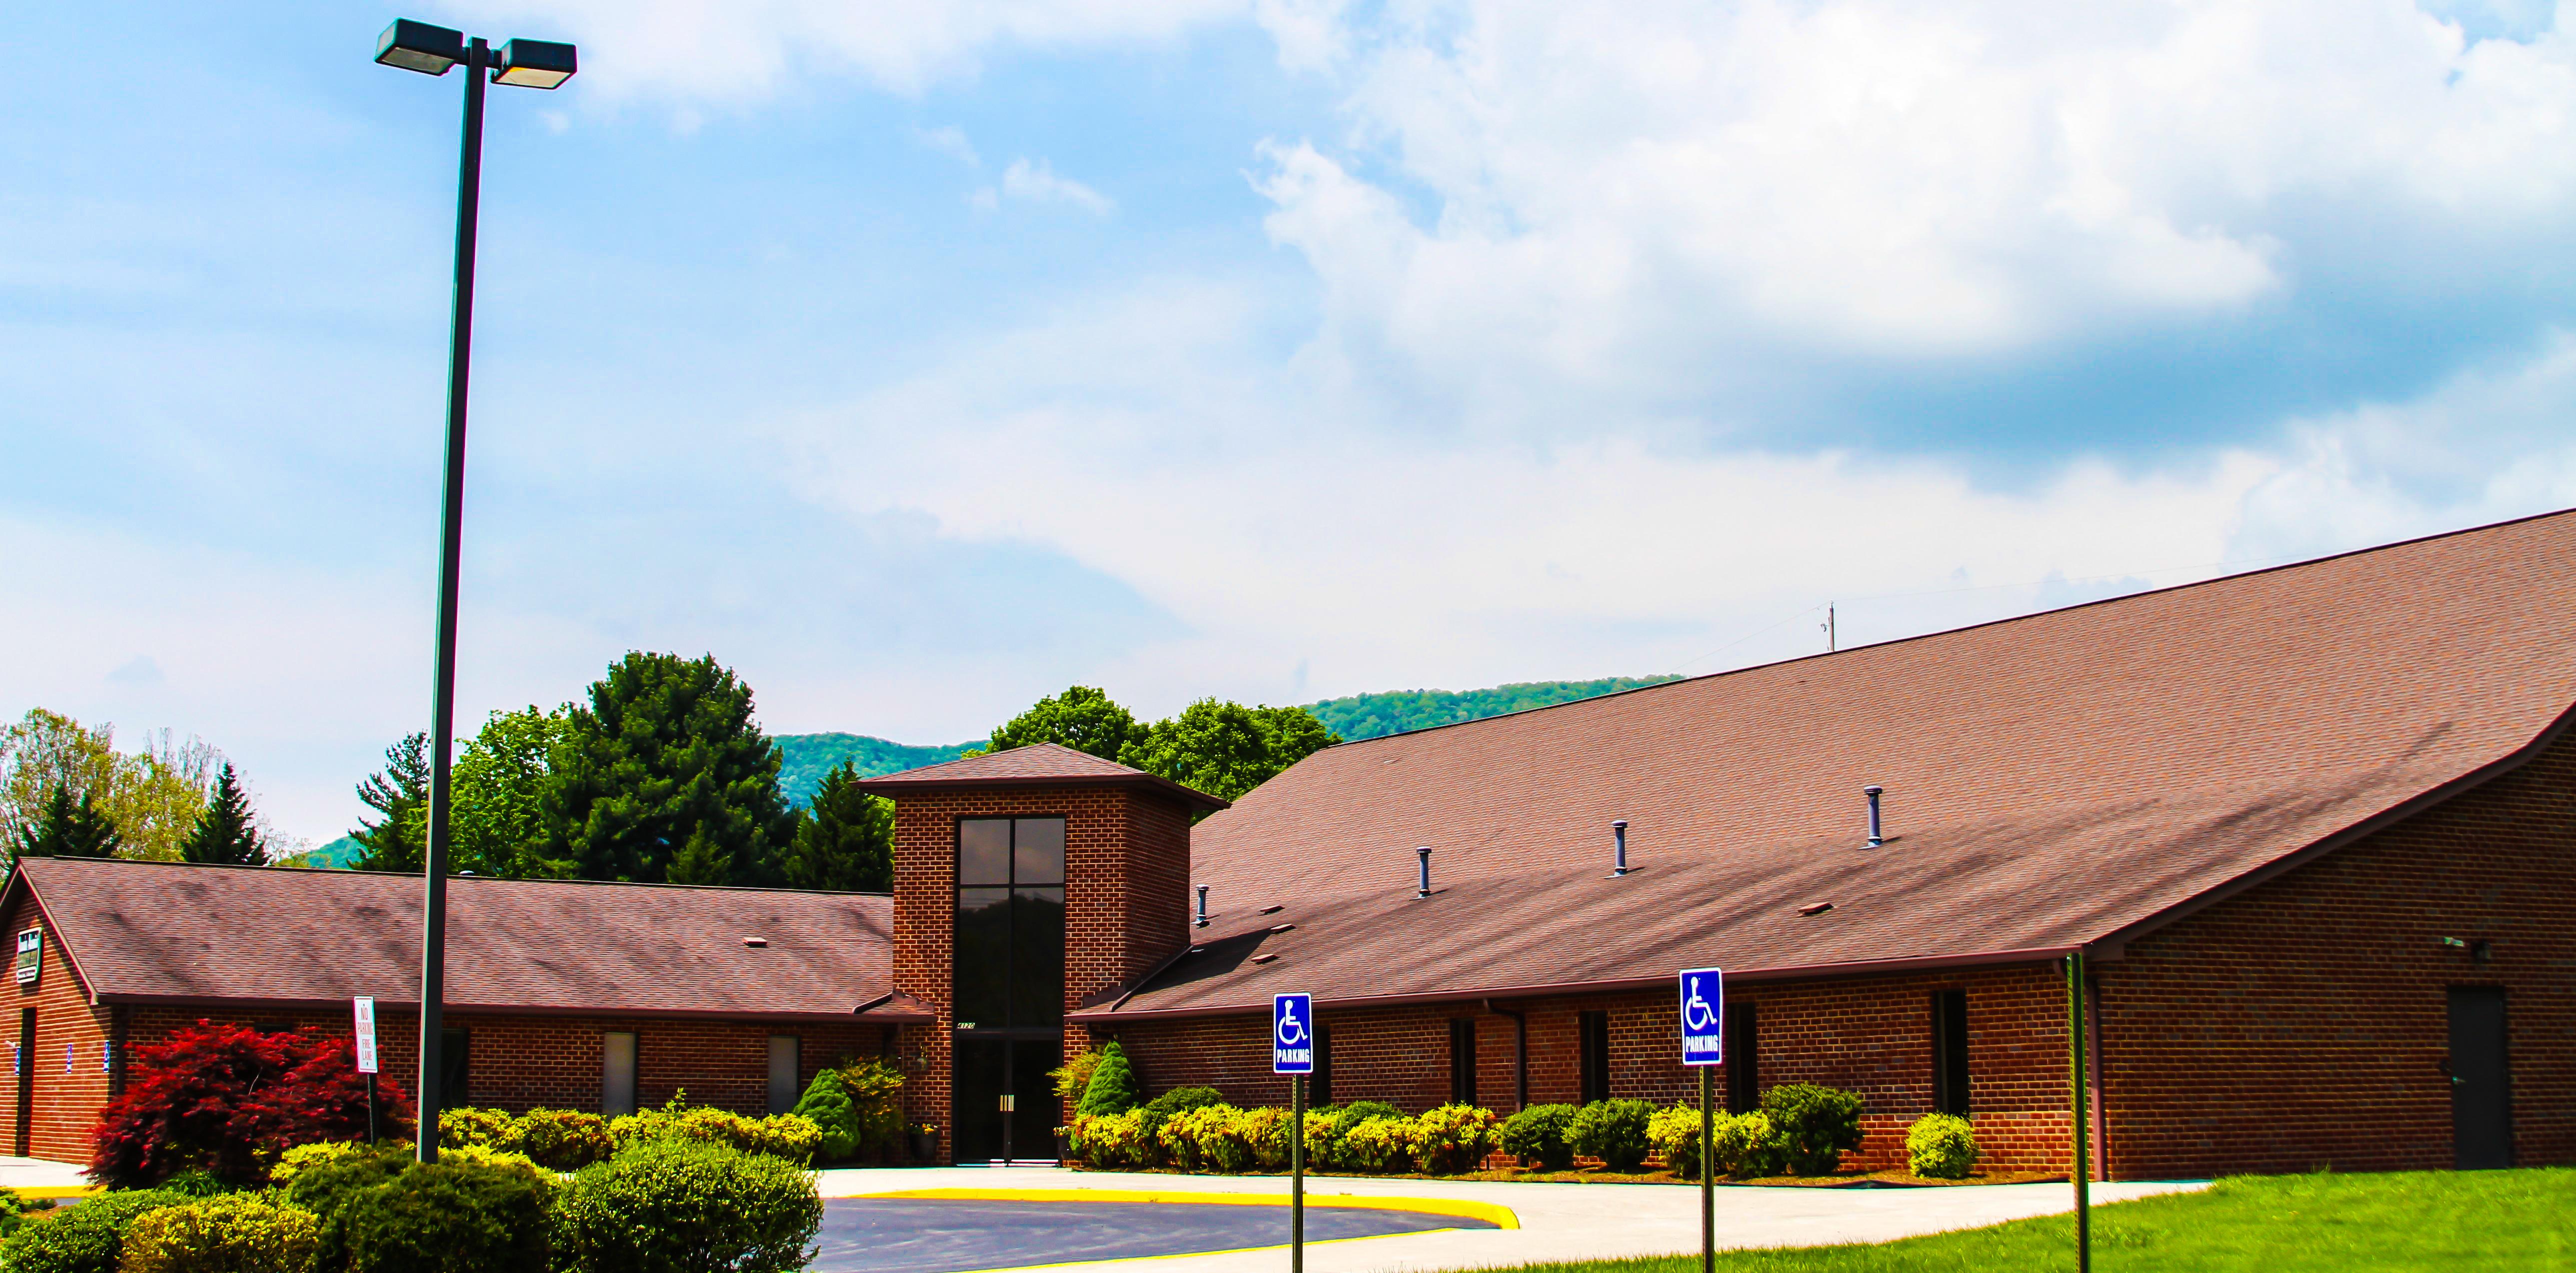 Roanoke Seventh Day Adventist Church